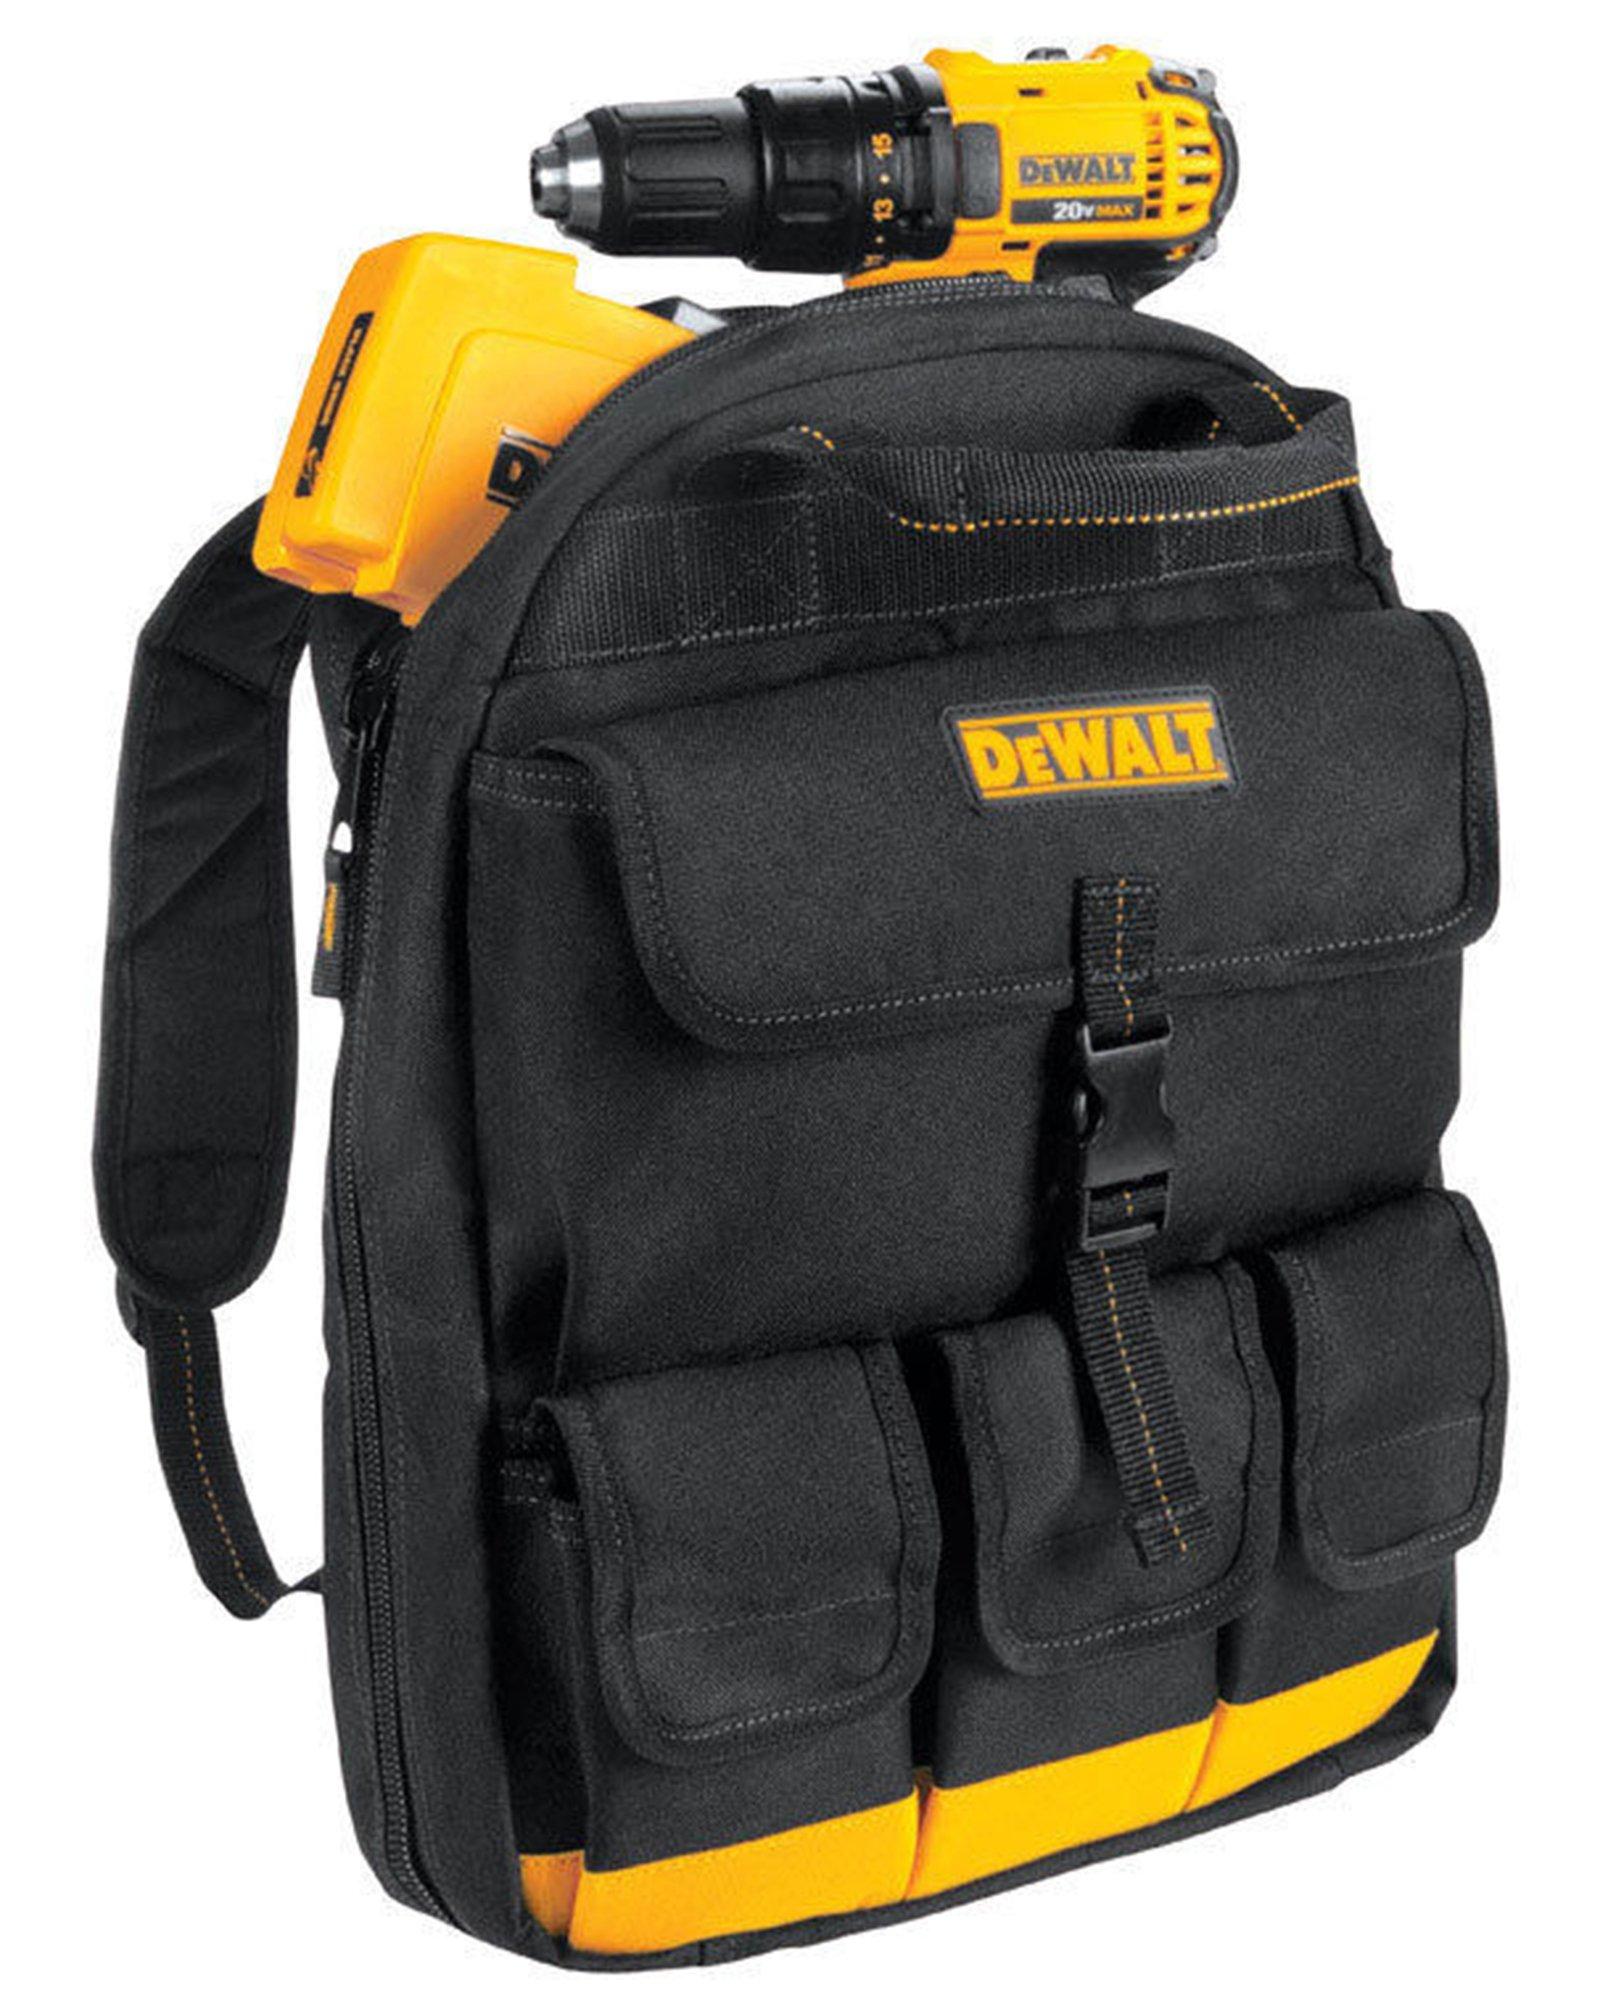 DeWalt DGC550 Backpack Tool Bag (25 Pocket), Black/Yellow